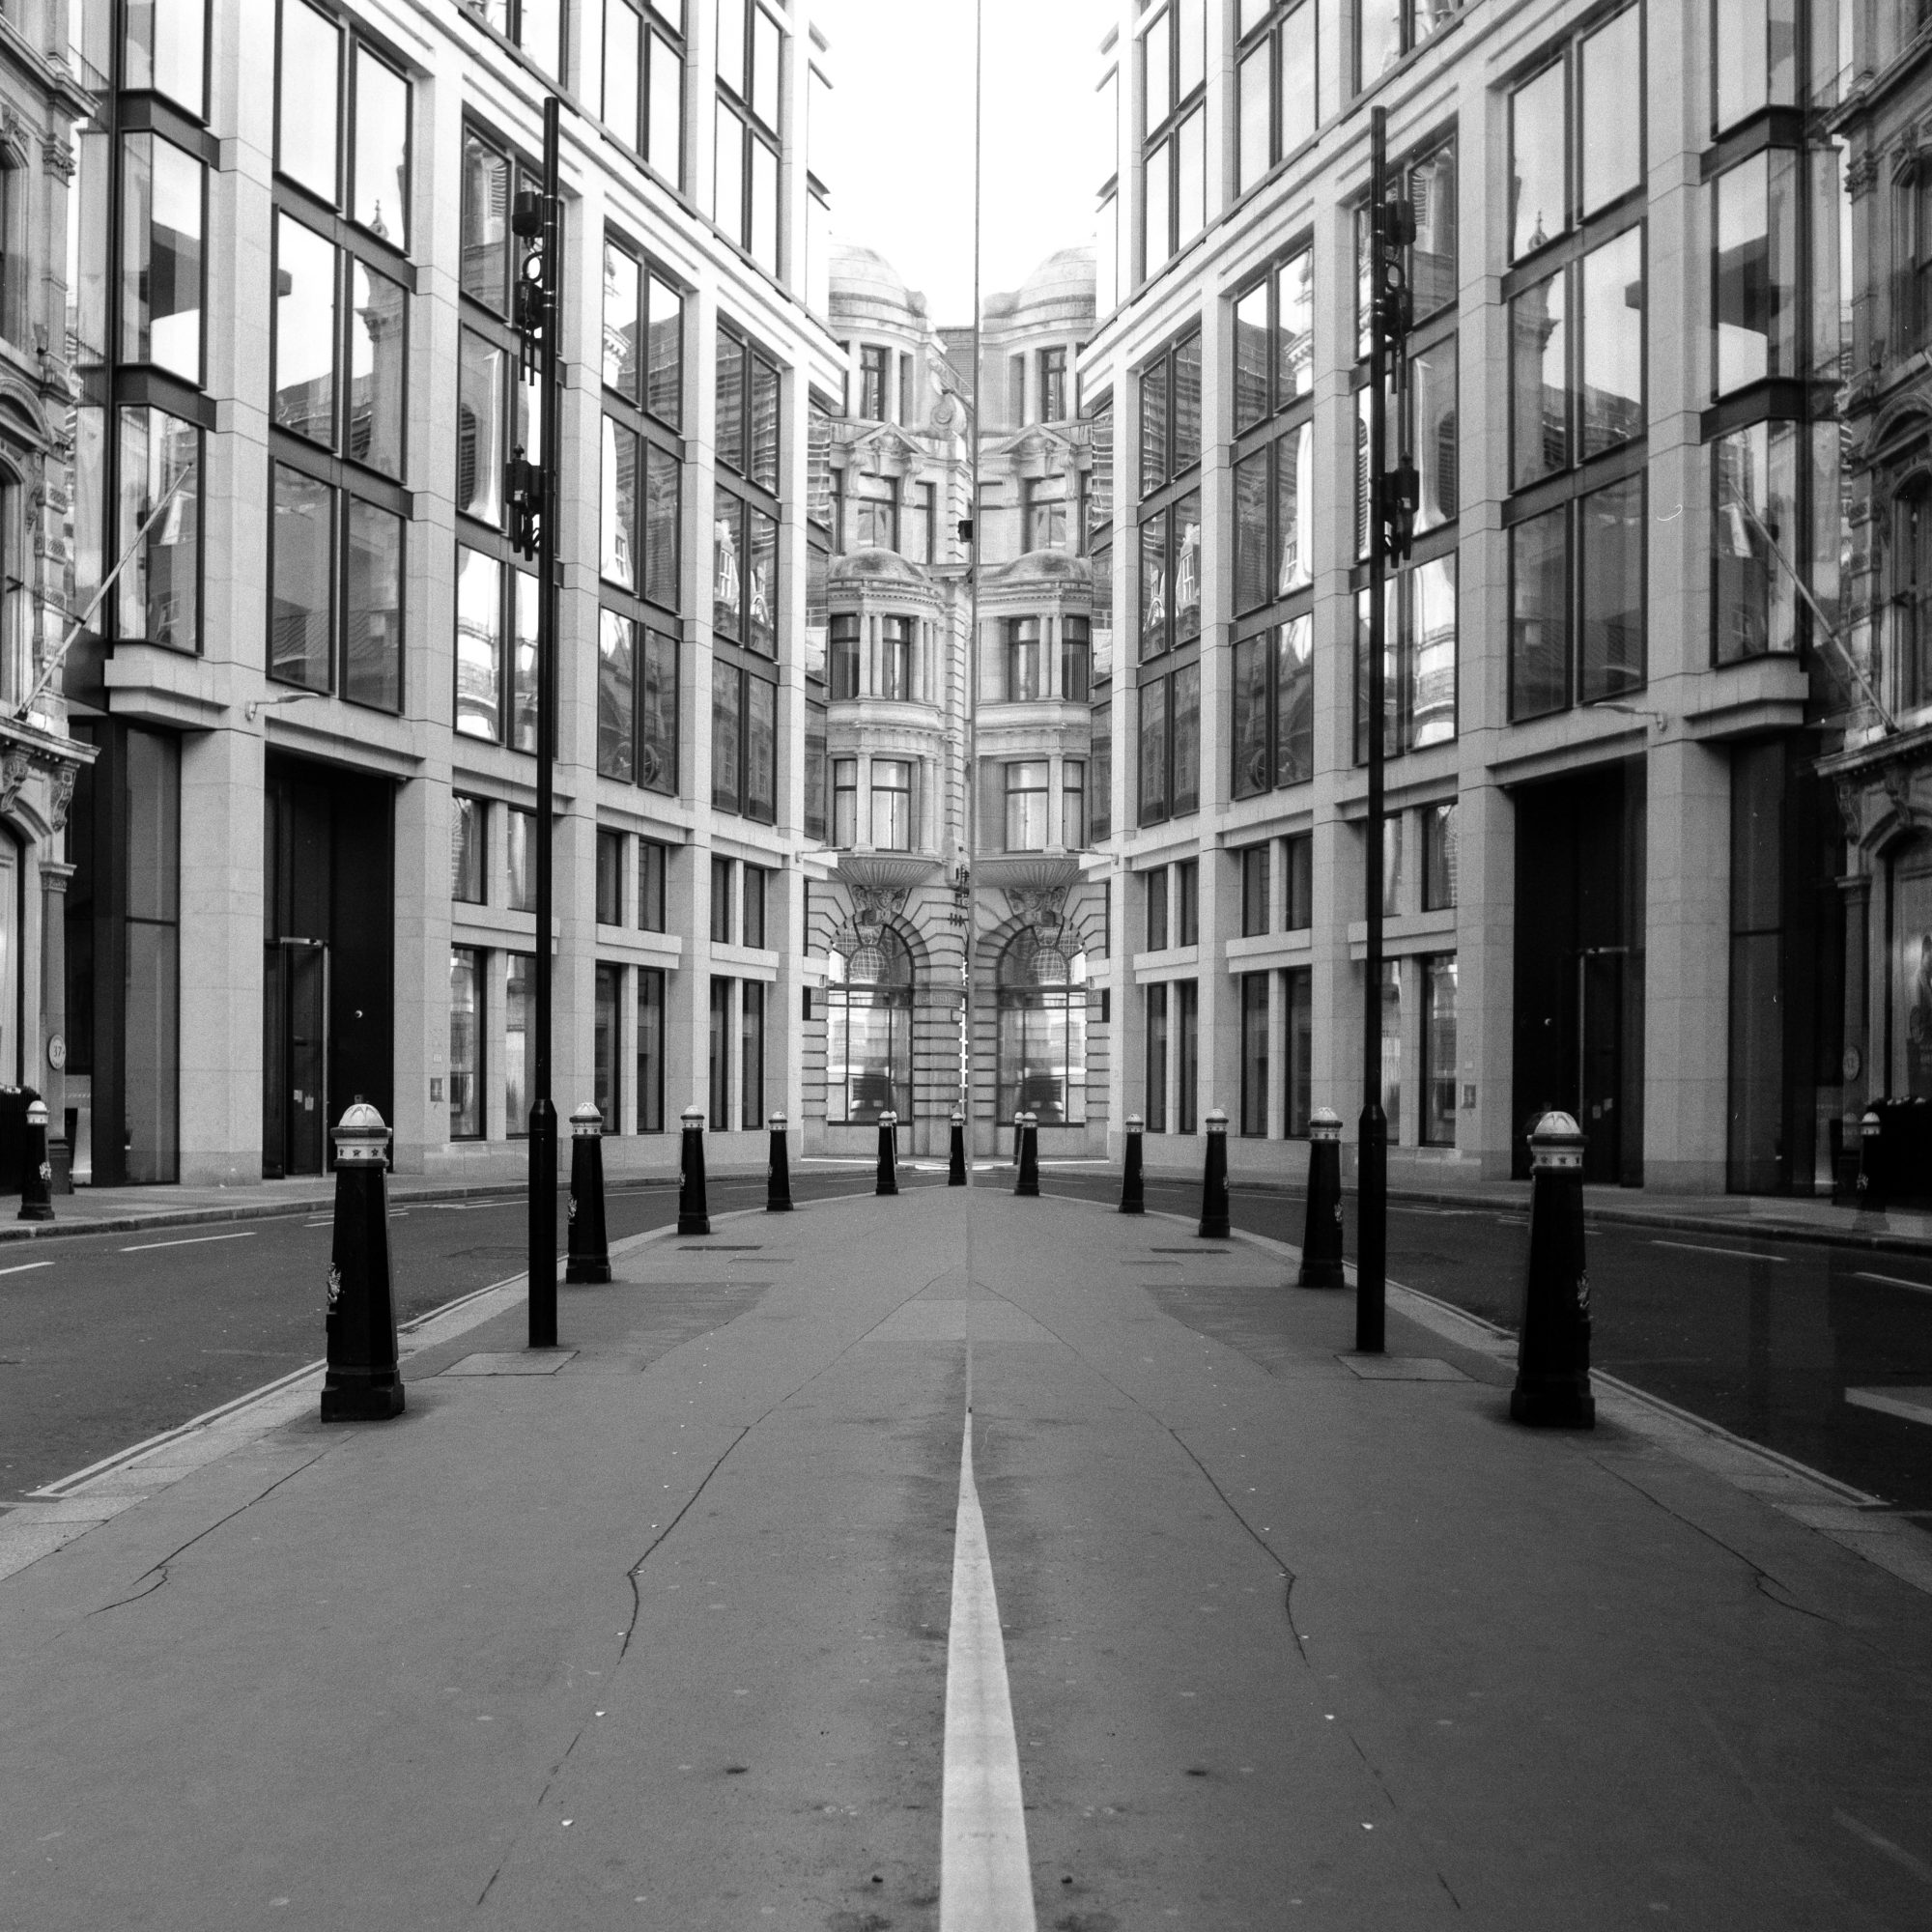 City street (Pic: Giacomo Mantovani)